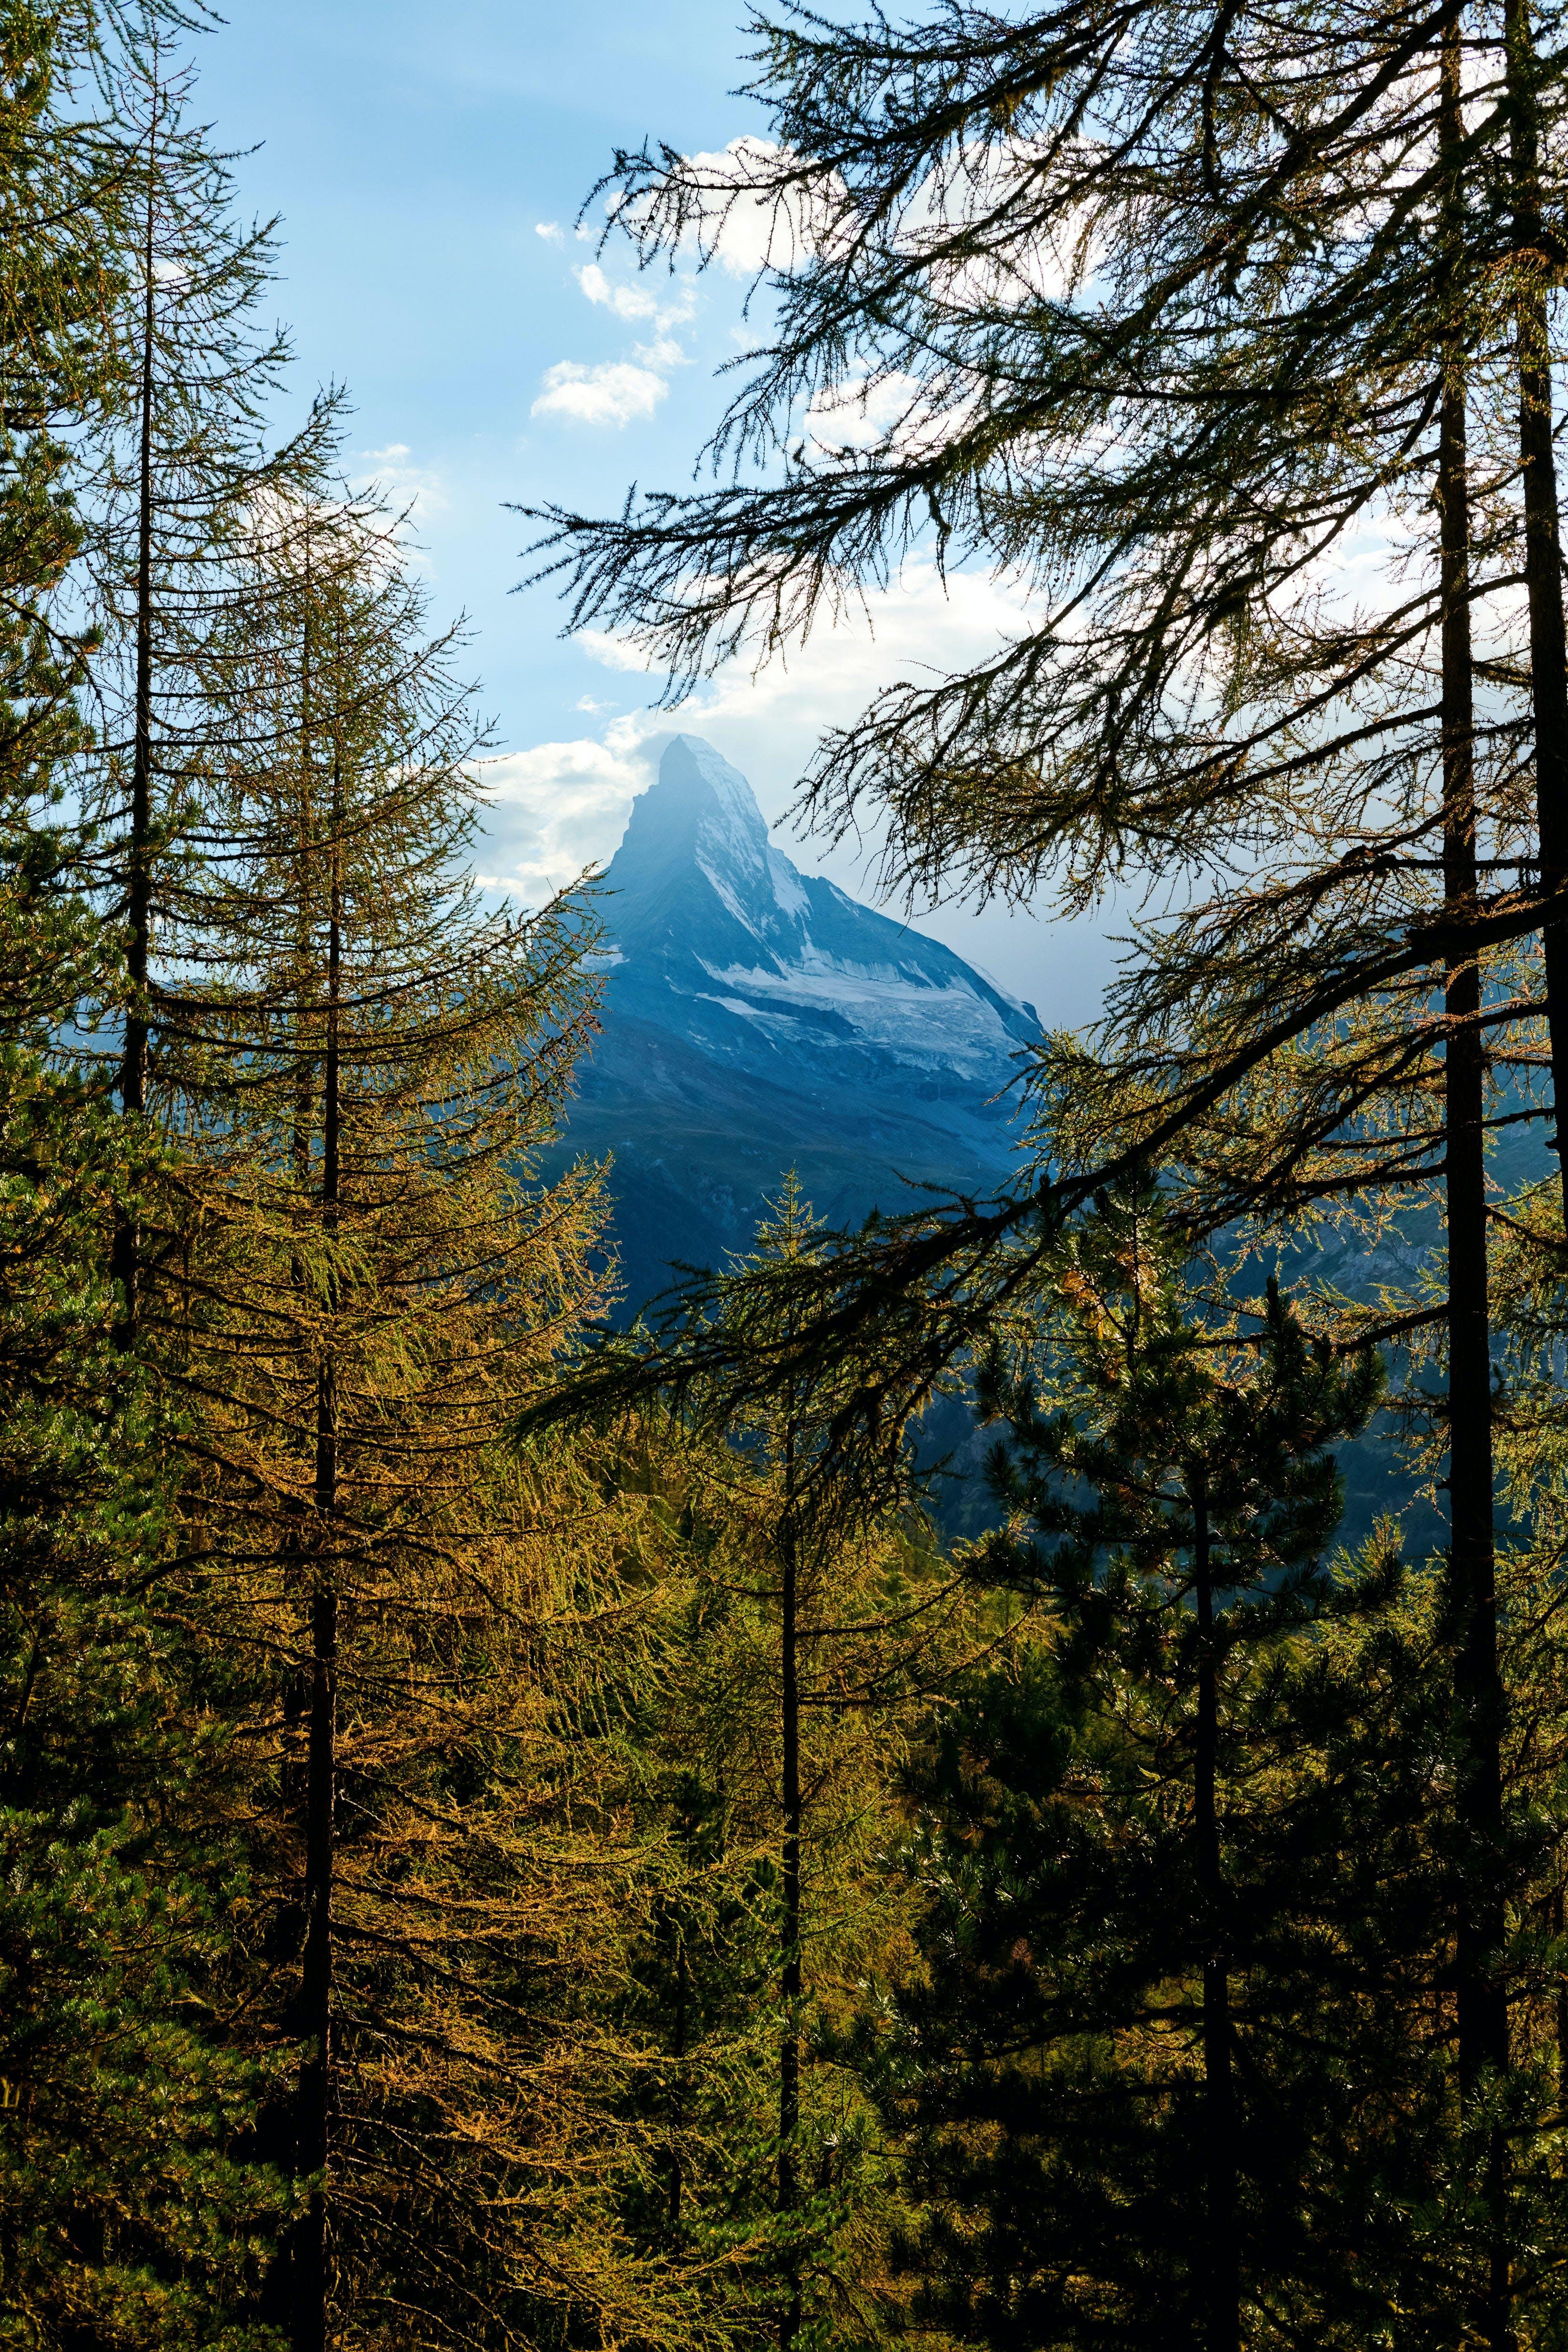 Kostenloses Stock Foto zu baum, bäume, berg, herbst